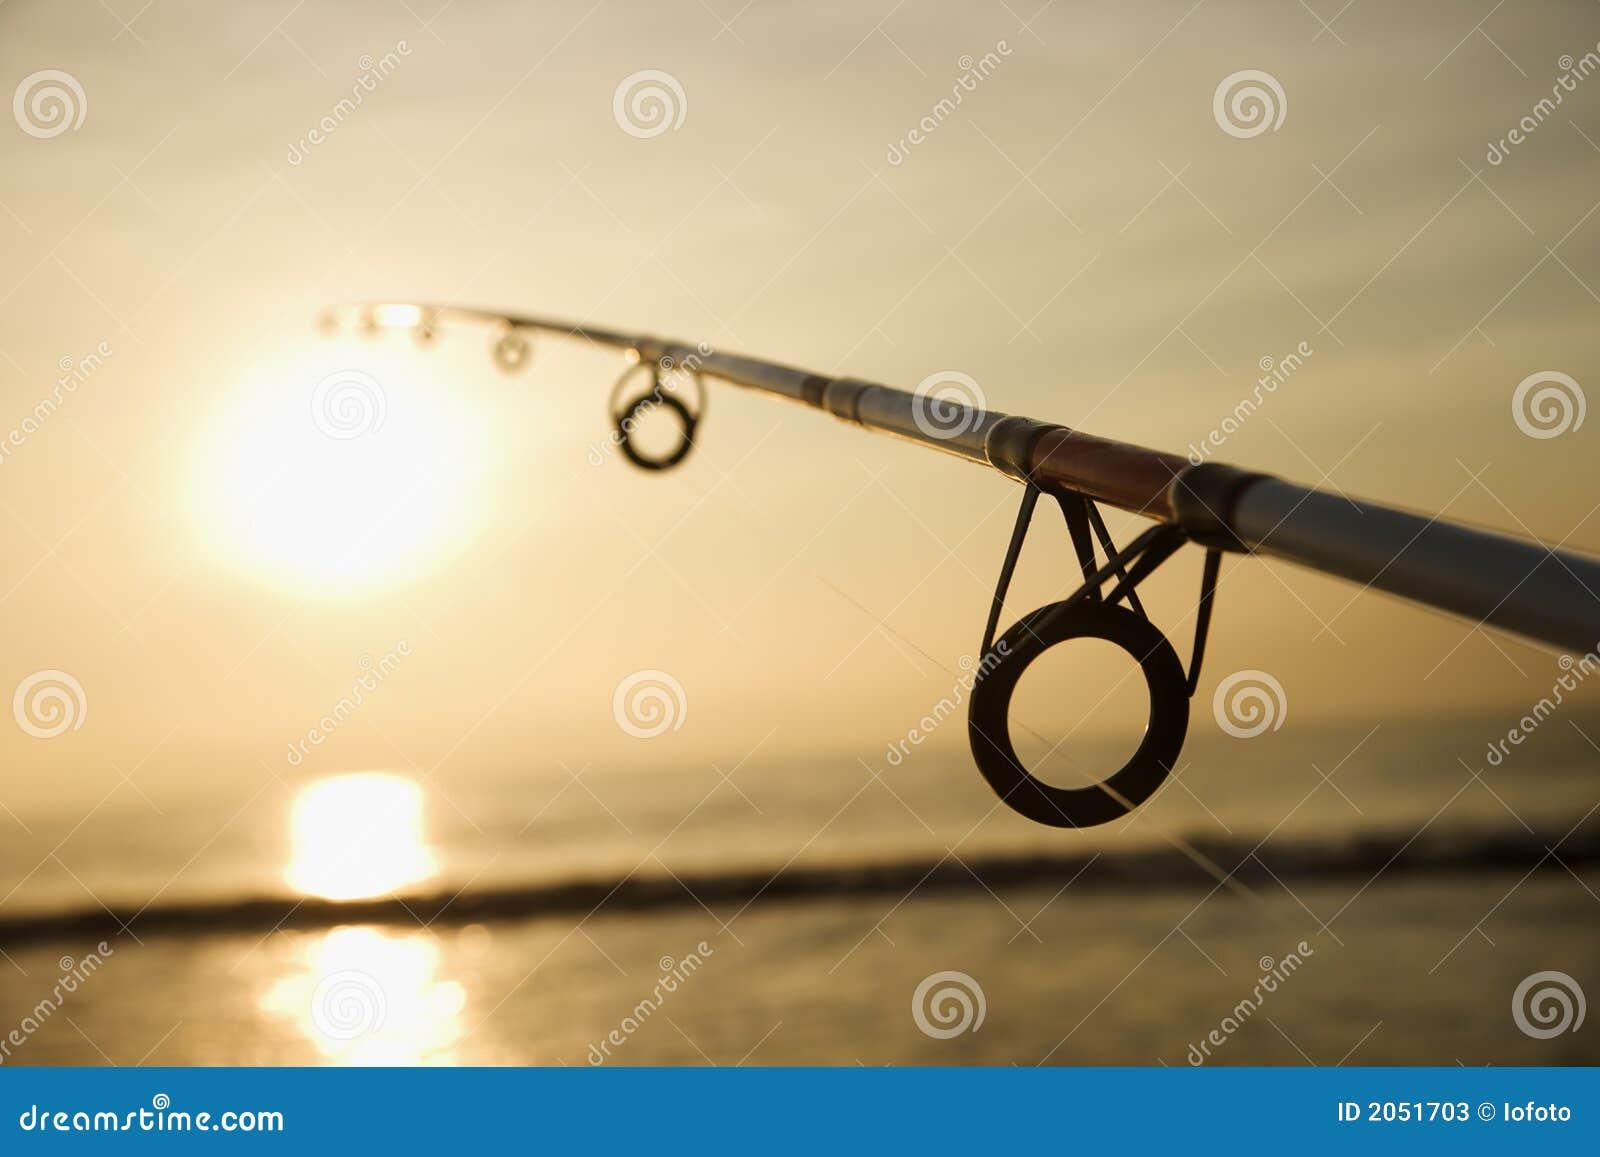 how to use fishing rod pokemon sun